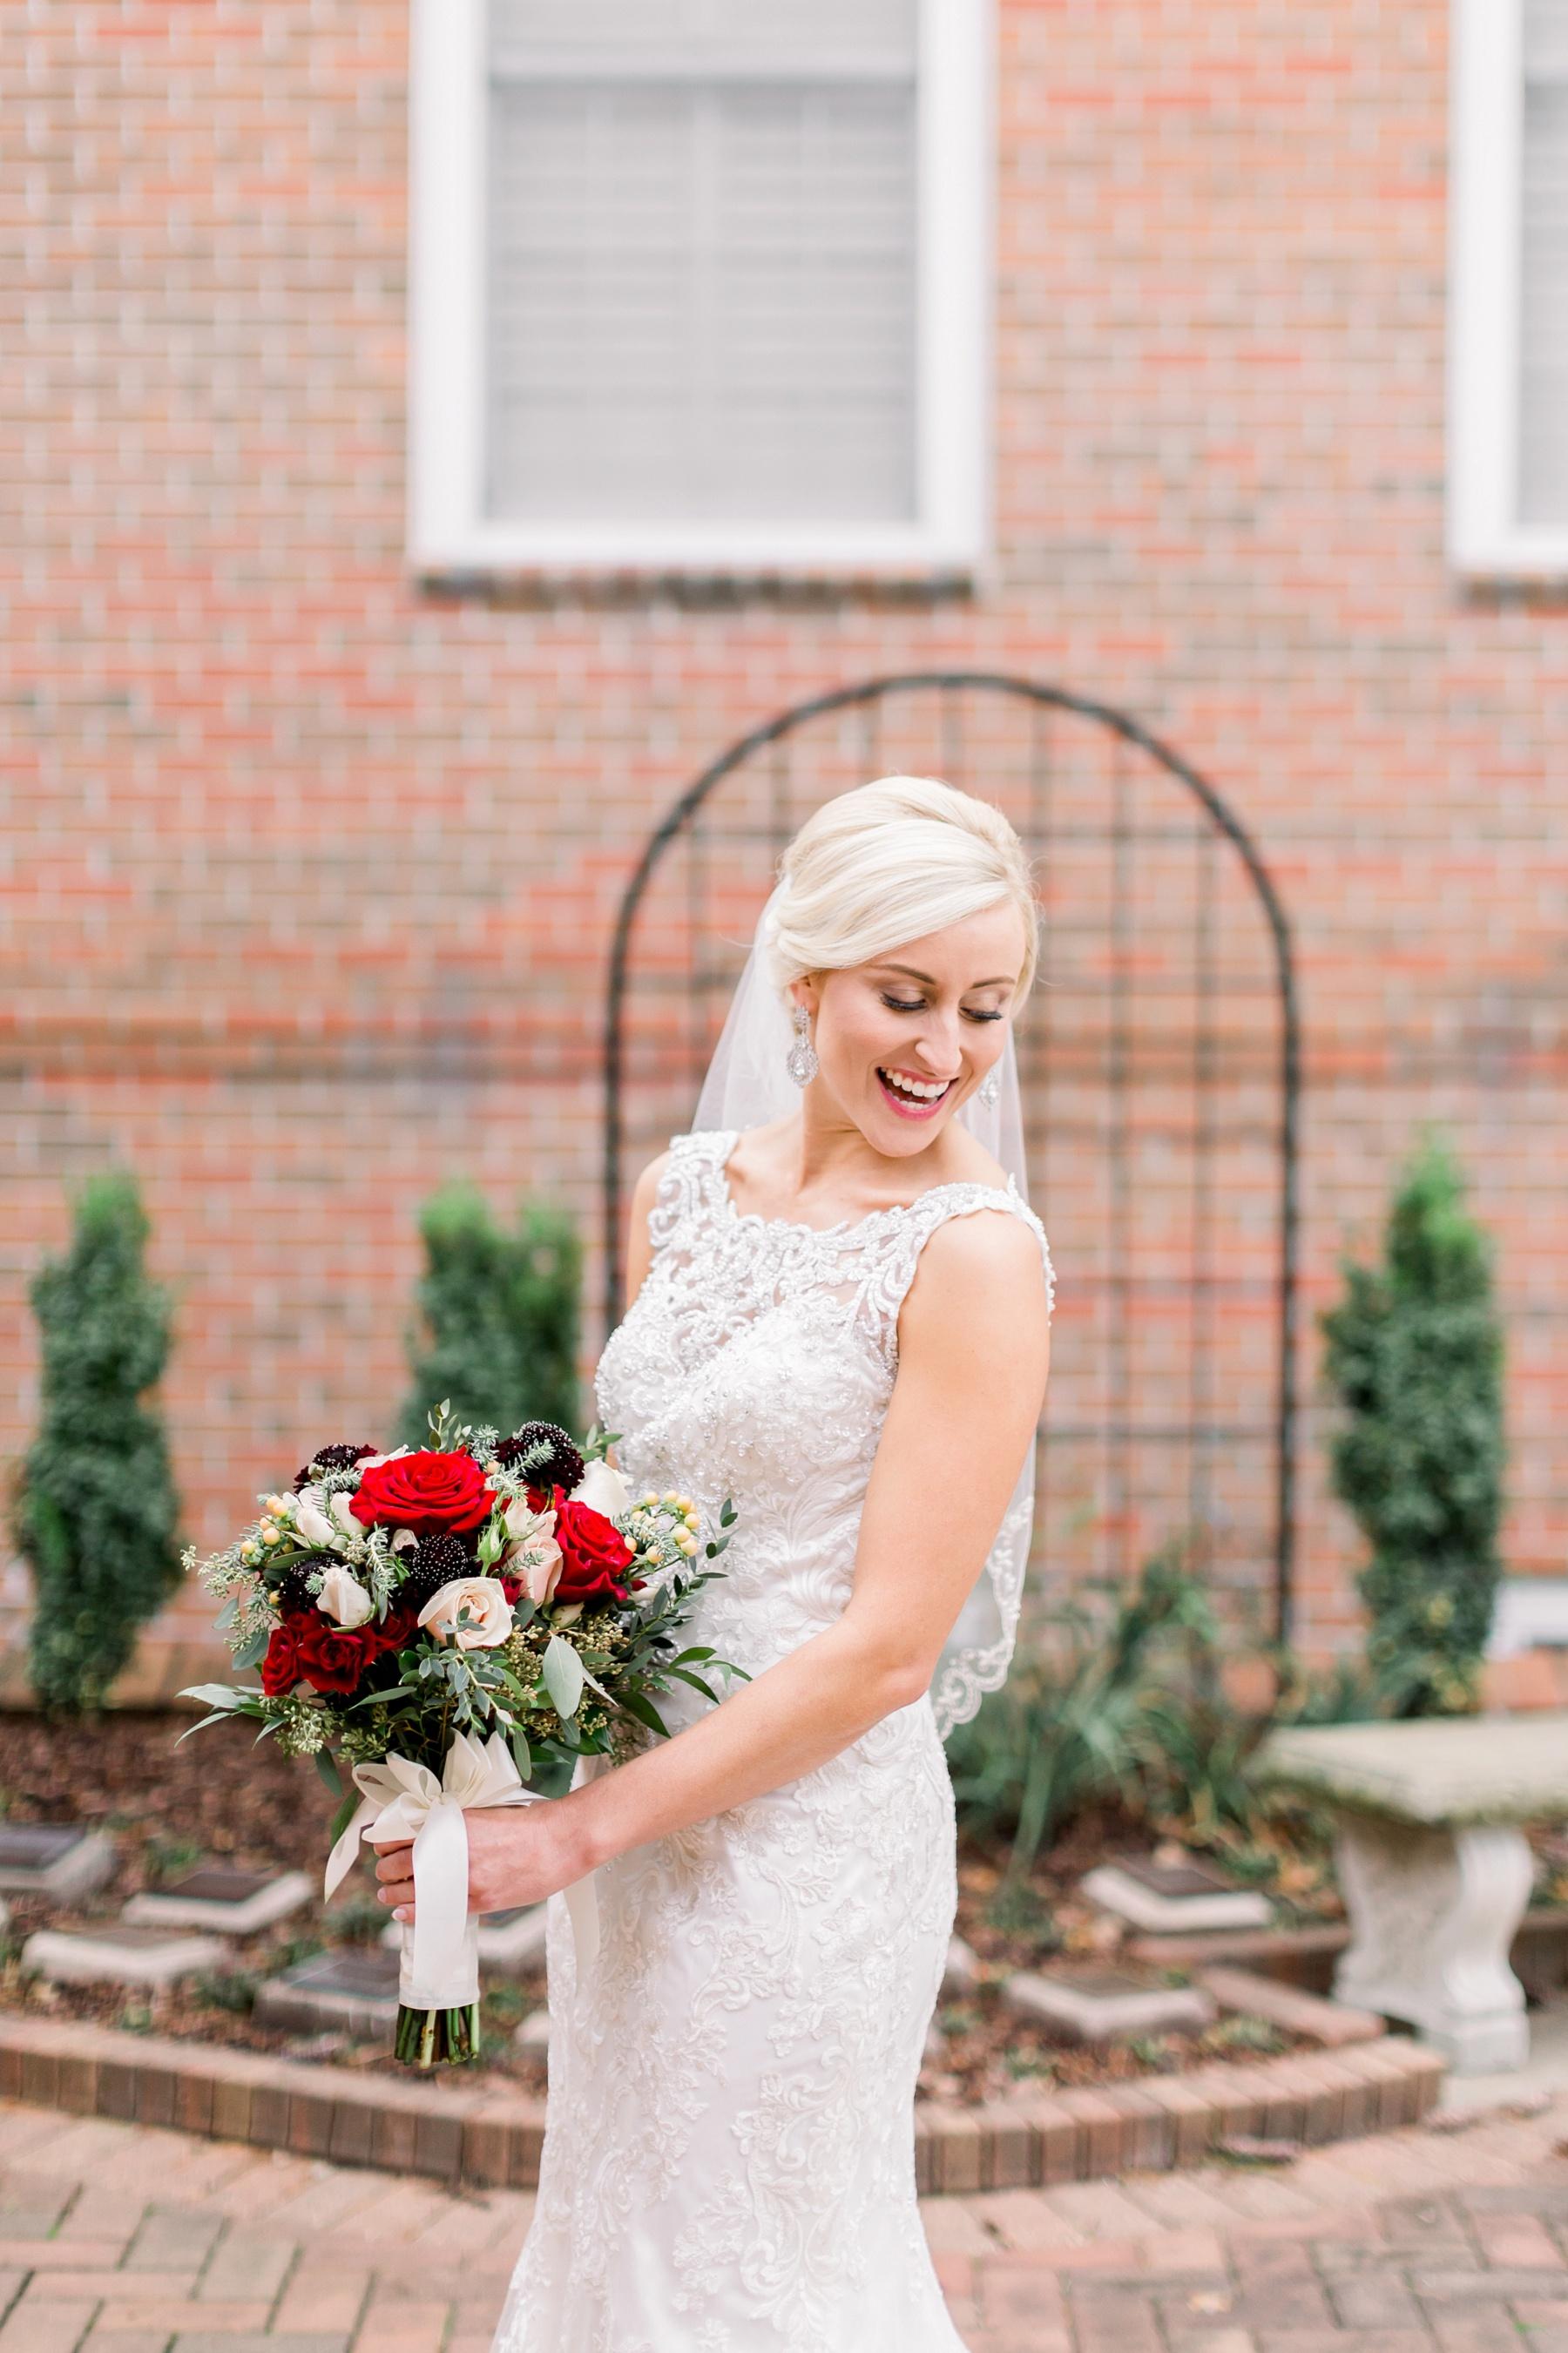 midwest-adventurous-wedding-photographer-elizabeth-ladean-photography-photo_4725.jpg